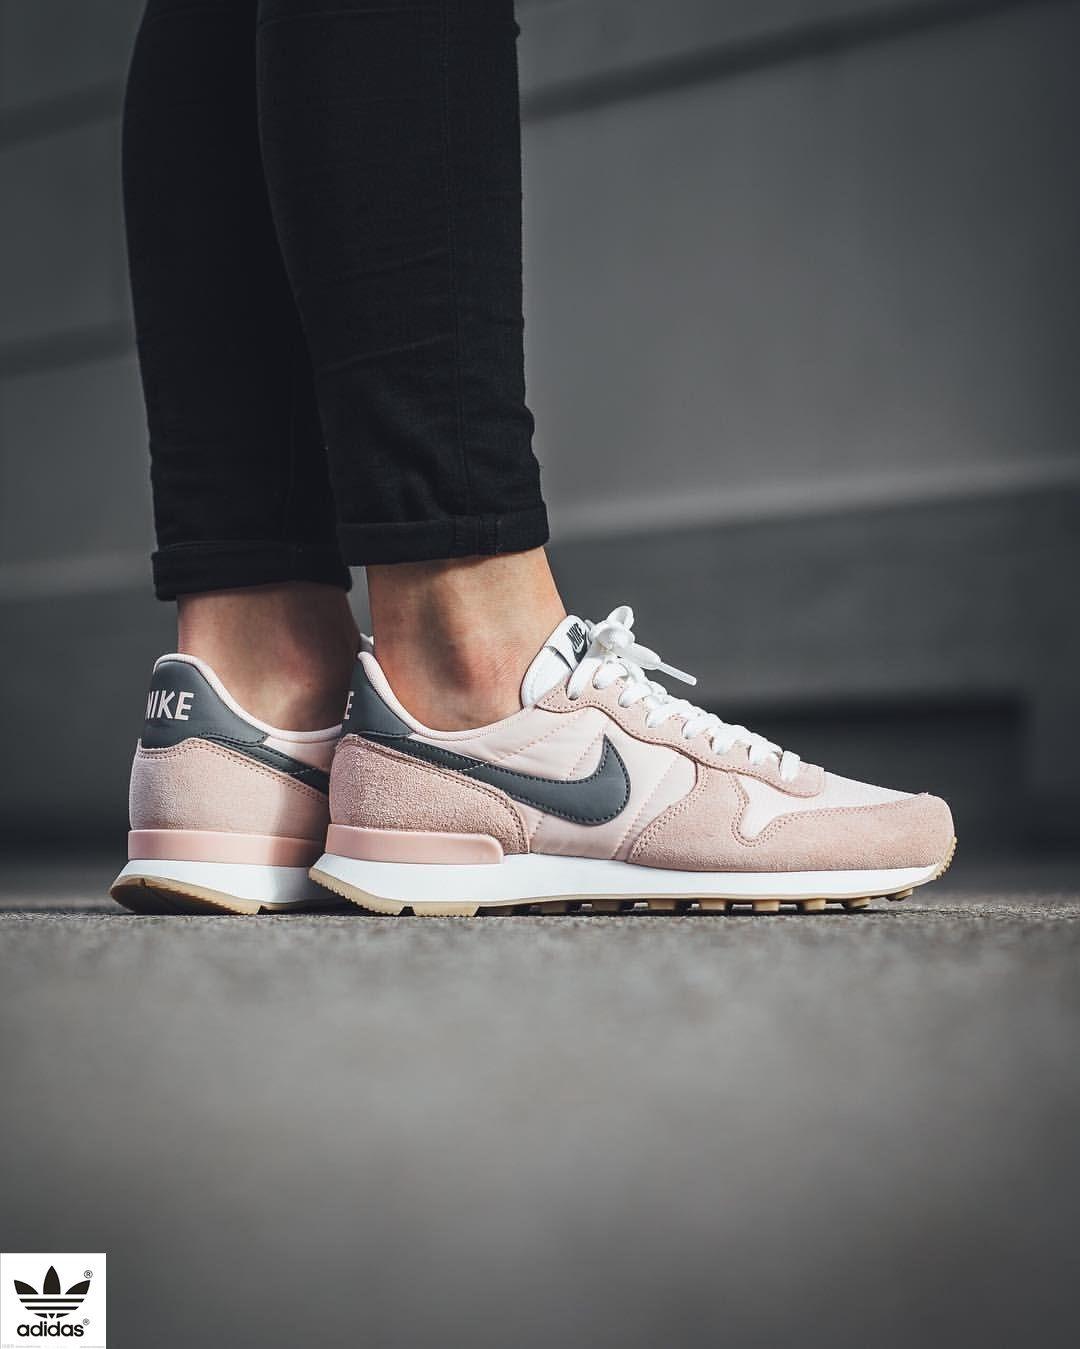 Nike Internationalist: Sunset Tint/Cool